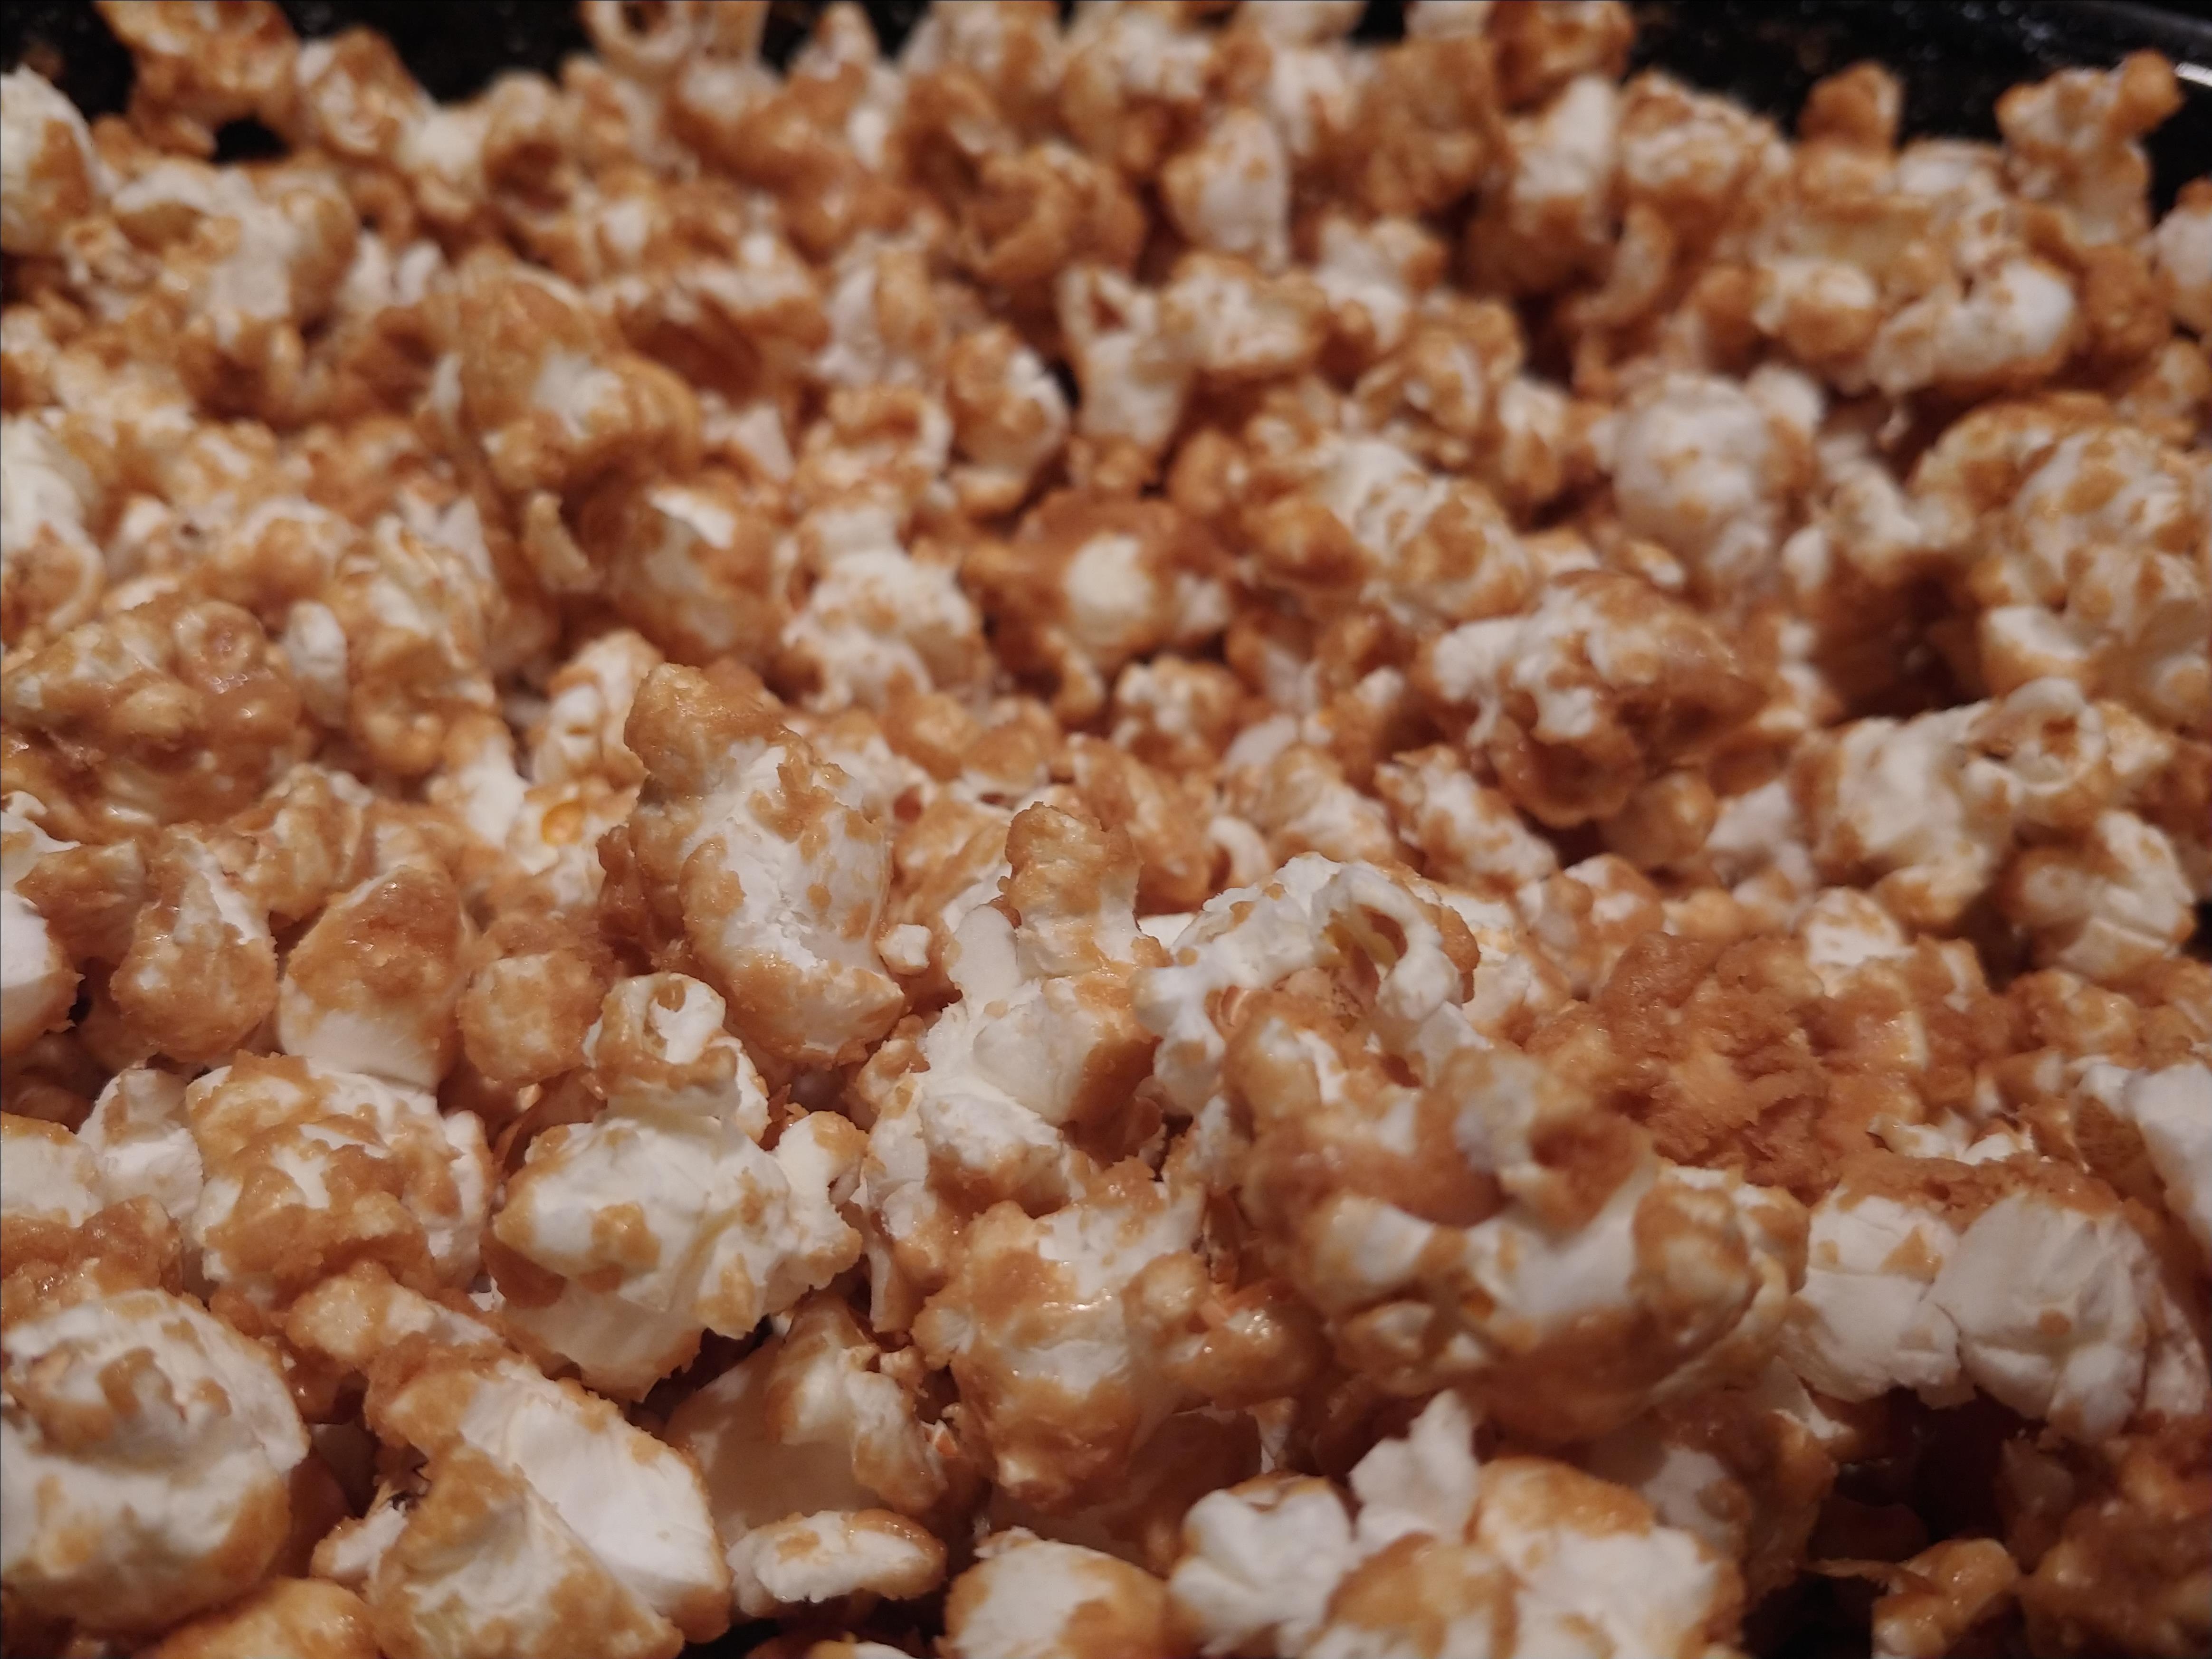 Caramel Popcorn Amy p8